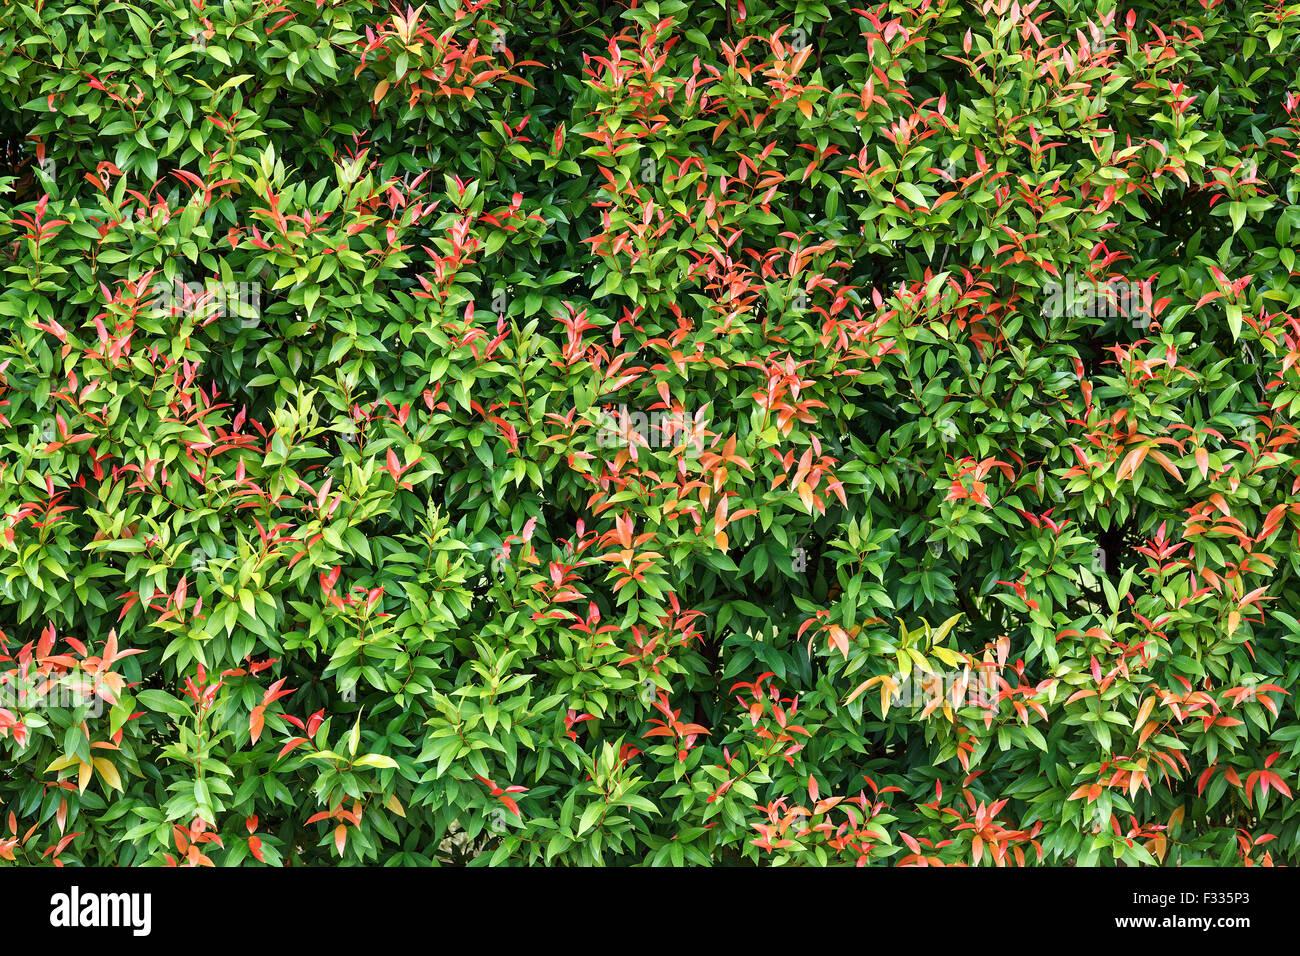 Background Wallpaper Green Leaf Natural Texture Pattern Forest Tree Outdoors Garden Greenleaf